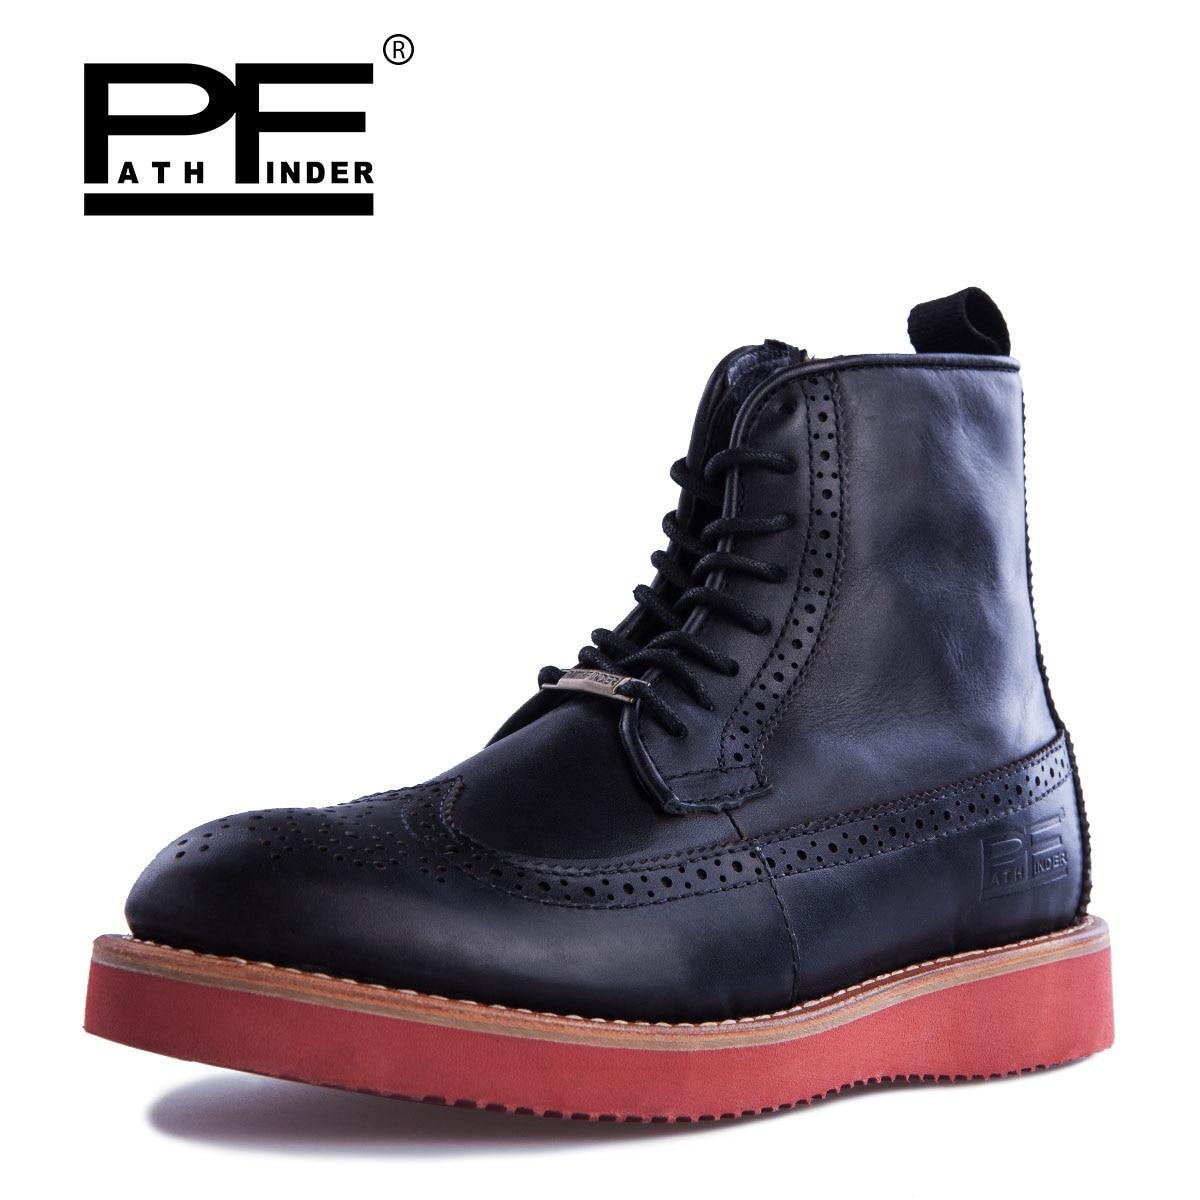 Pathfinder 100% Genuine Leather High Quality Mens Botas Original Brand Design Four Seasons Casual Martin Botas Warm Winter Shoes<br><br>Aliexpress